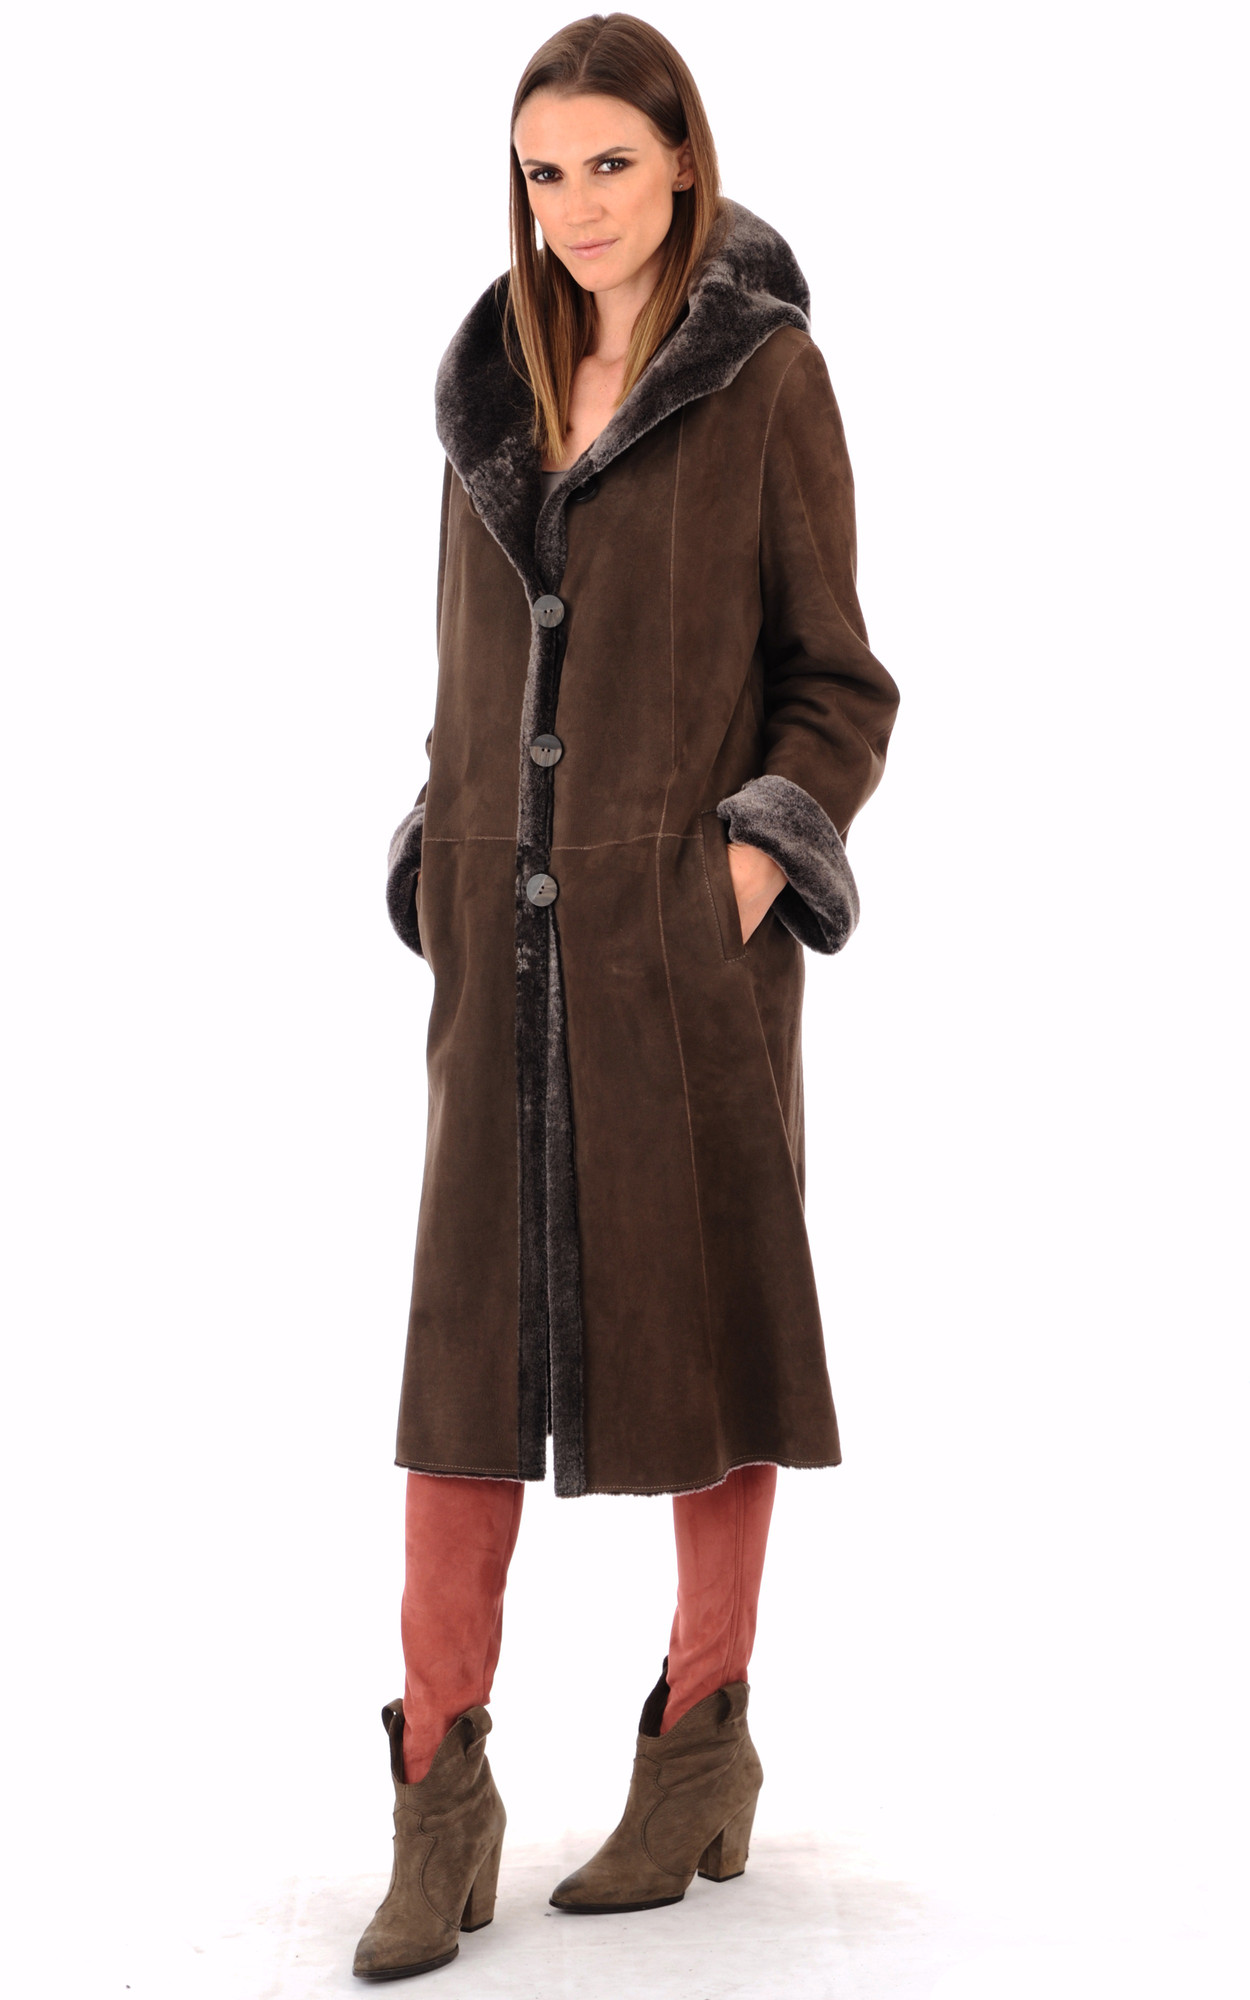 Manteau court peau retournee femme